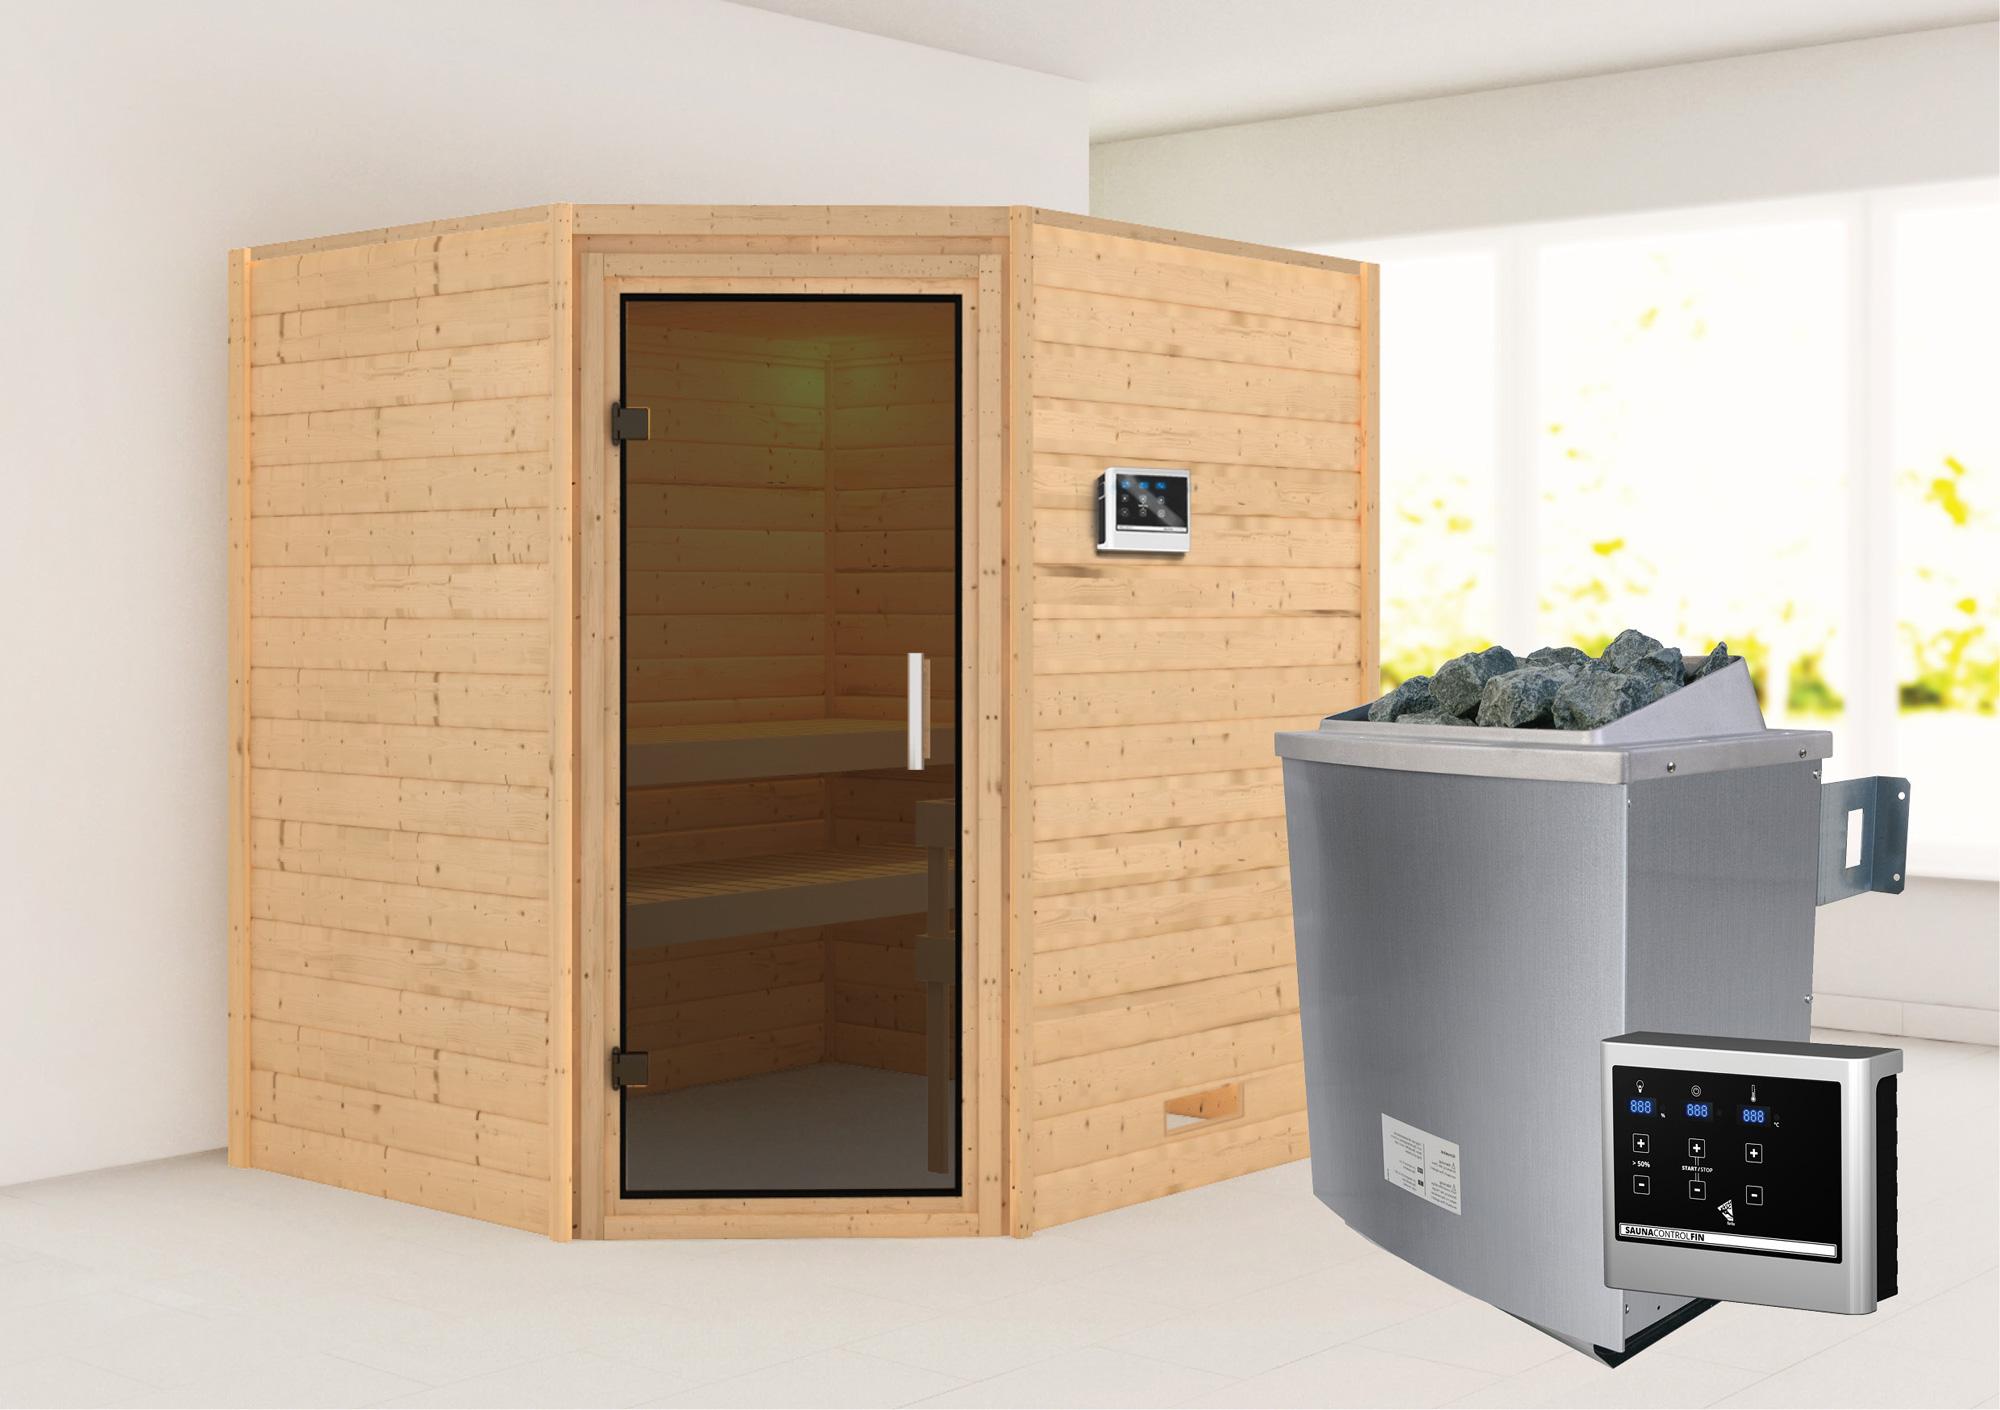 WoodFeeling Sauna Mia 38mm Saunaofen 9kW extern moderne Tür Bild 1